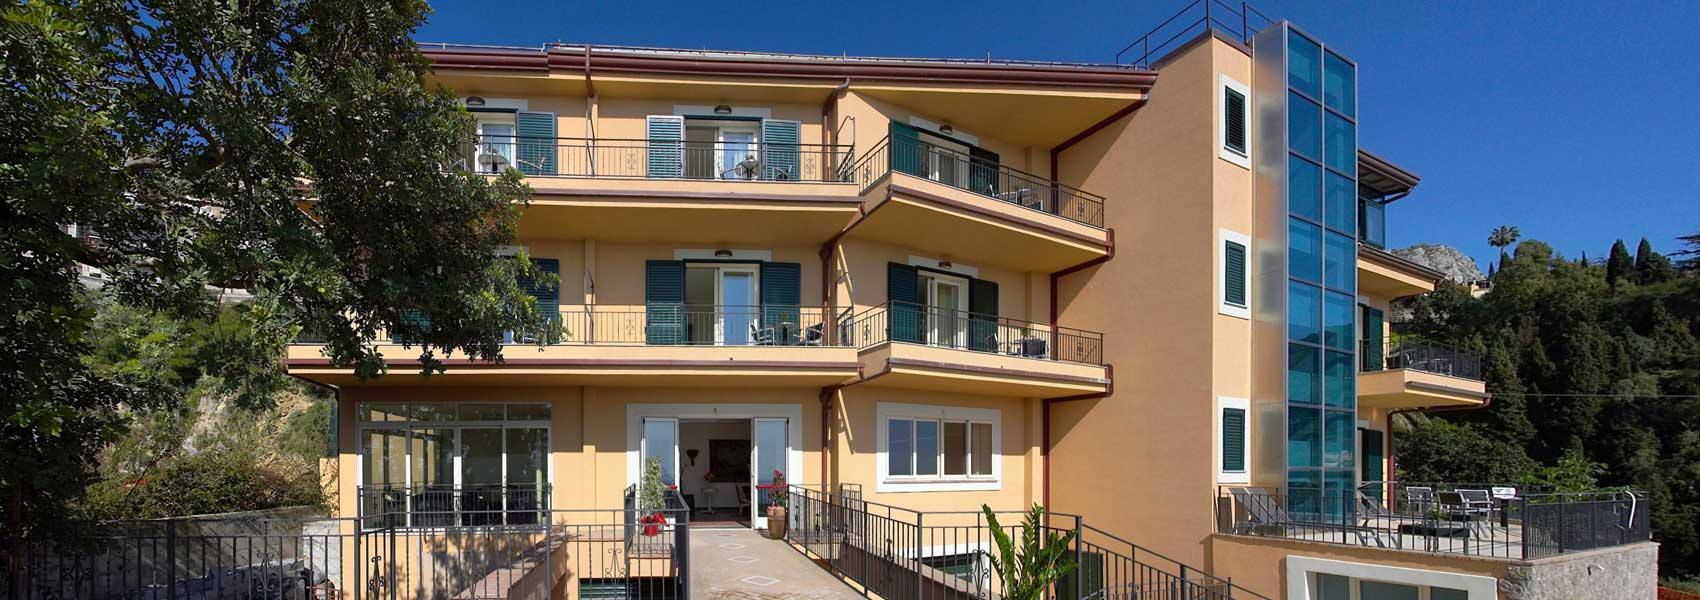 Hotel Con Piscina Taormina Centro